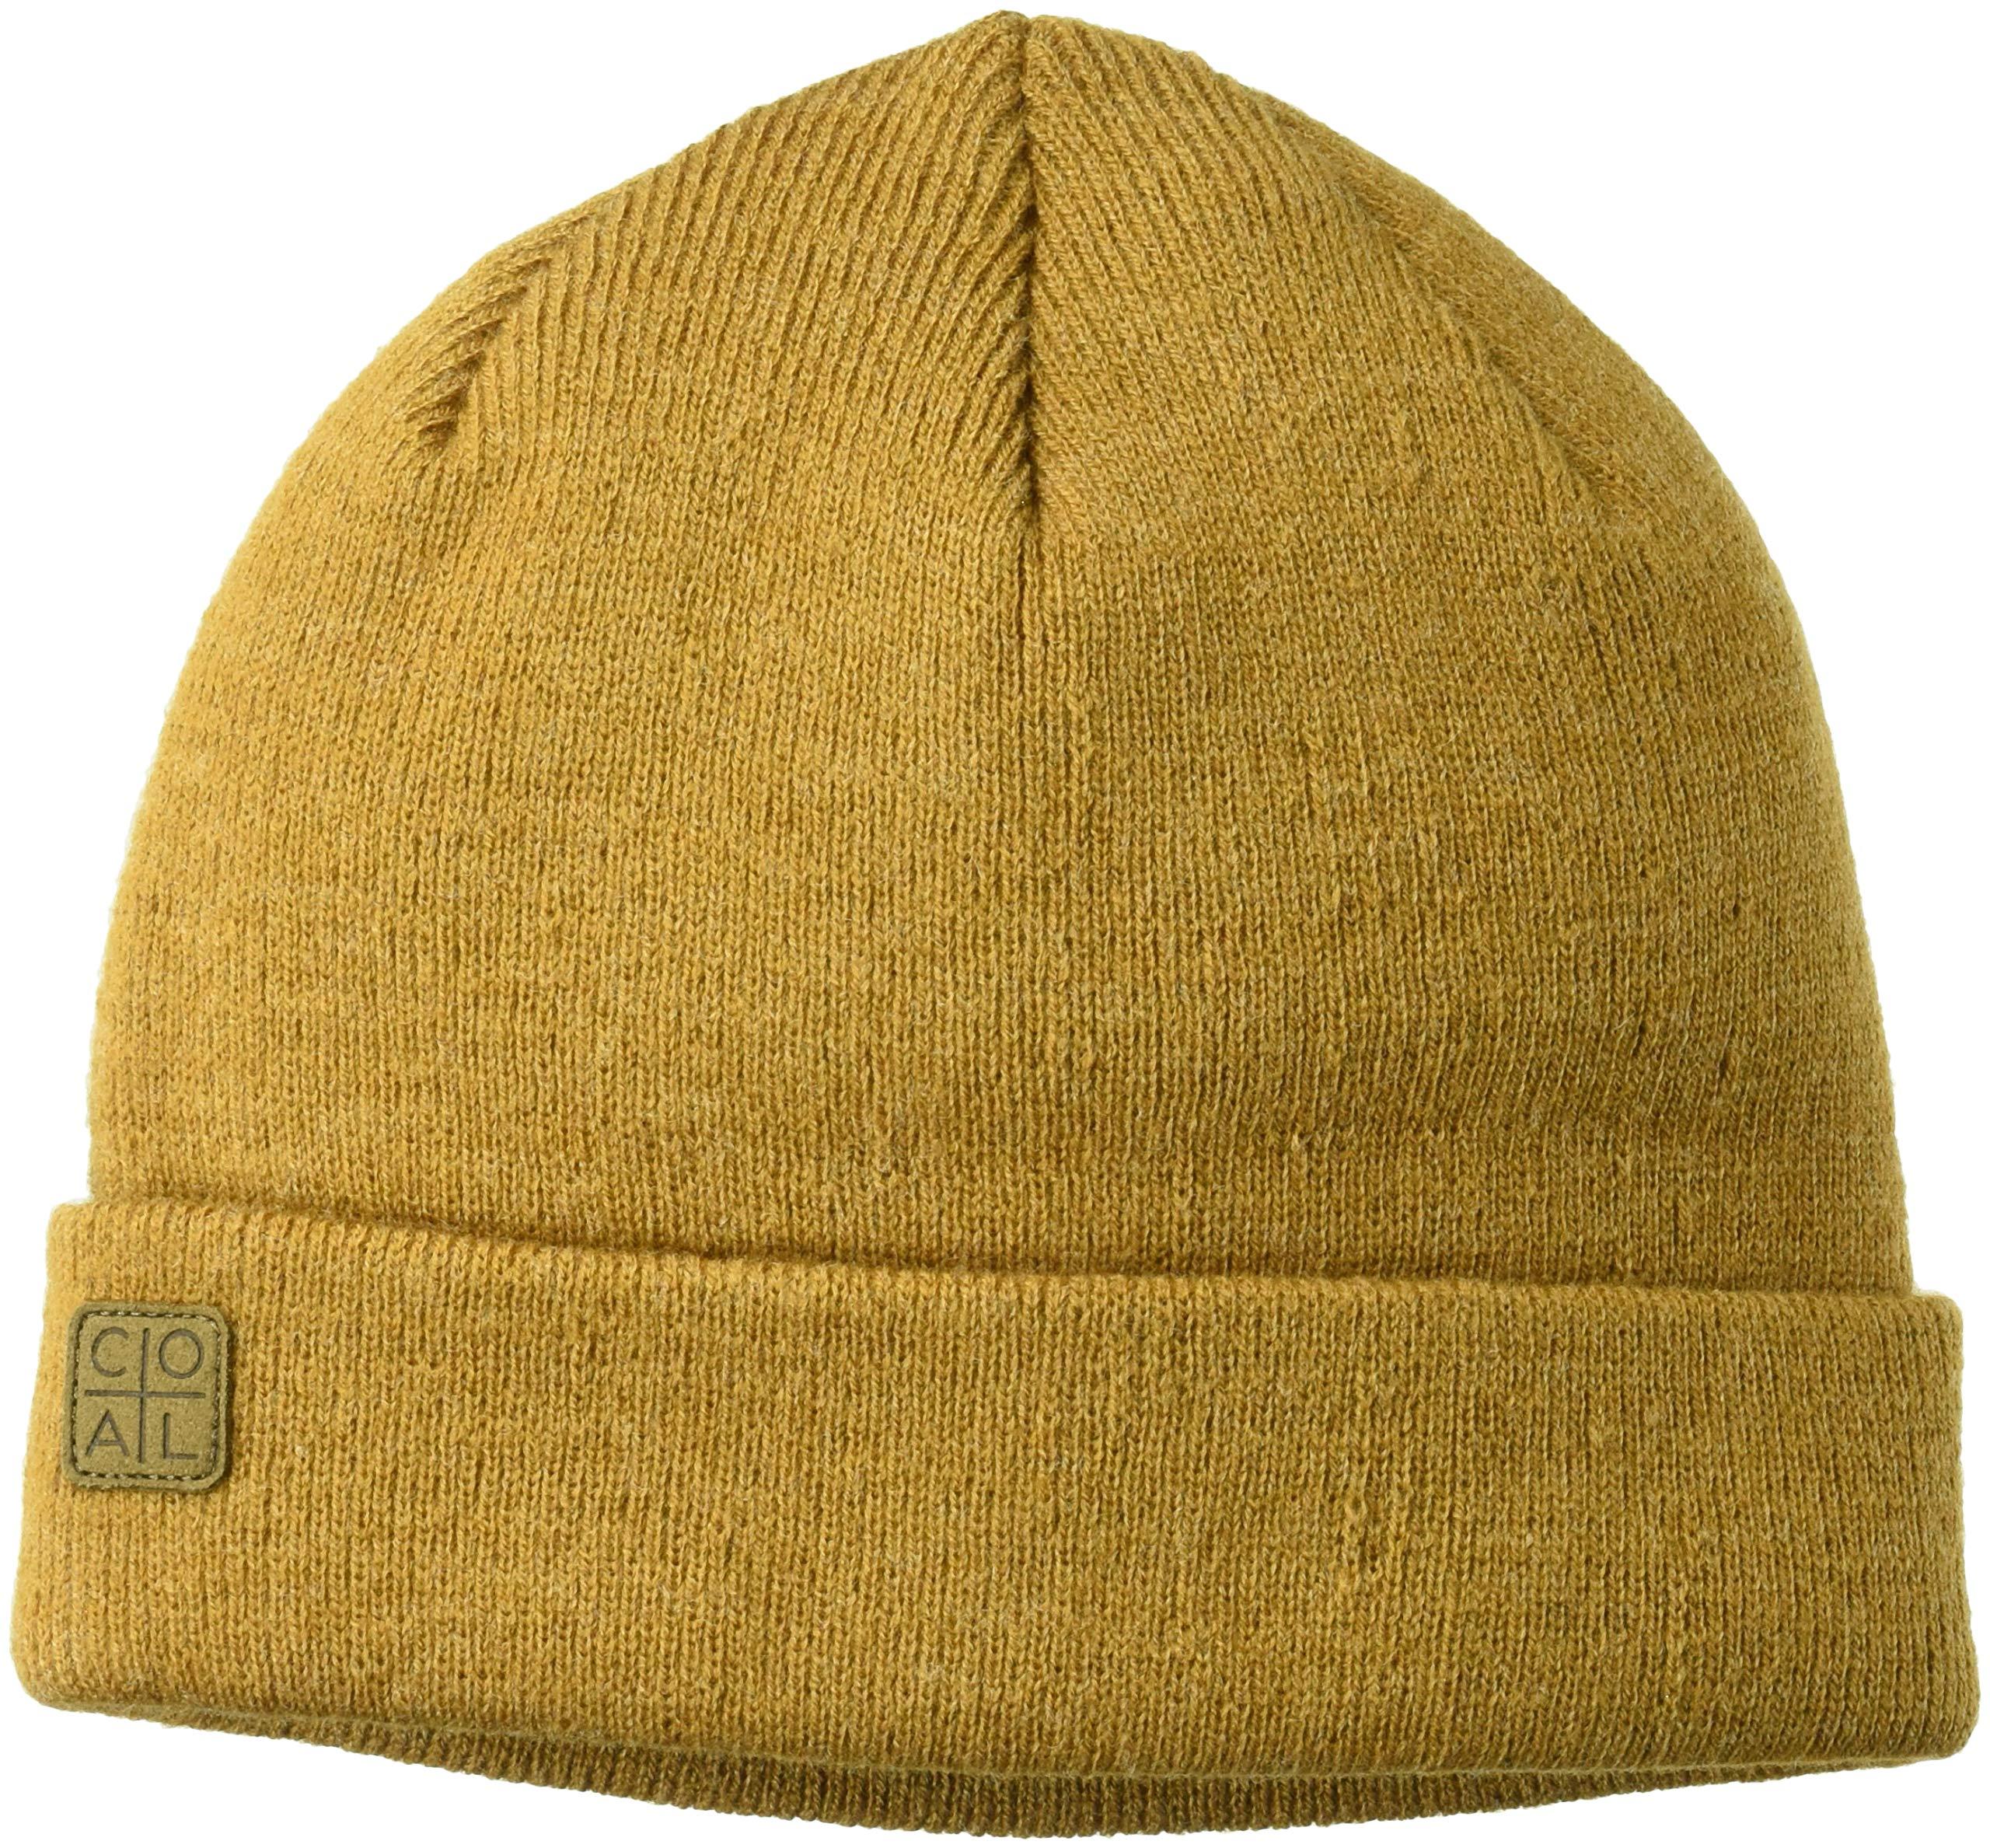 Coal Men's The Harbor Classic Fine Knit Cuffed Beanie Hat, Heather Mustard, Low Profile